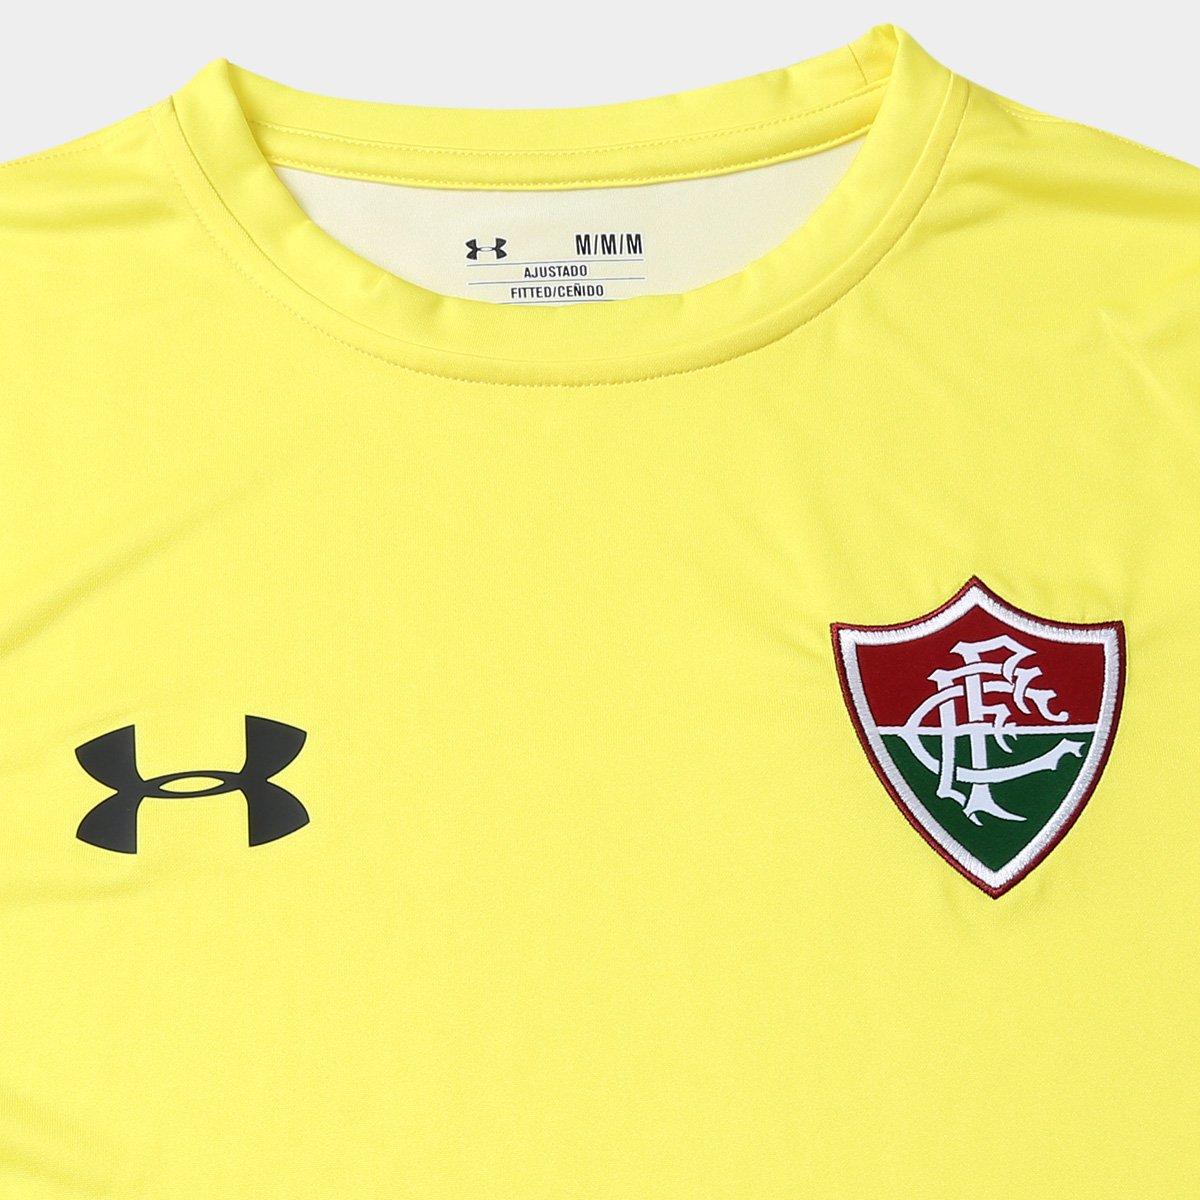 e29c885717 Camisa Fluminense Goleiro II 17 18 Torcedor Under Armour Masculina ...